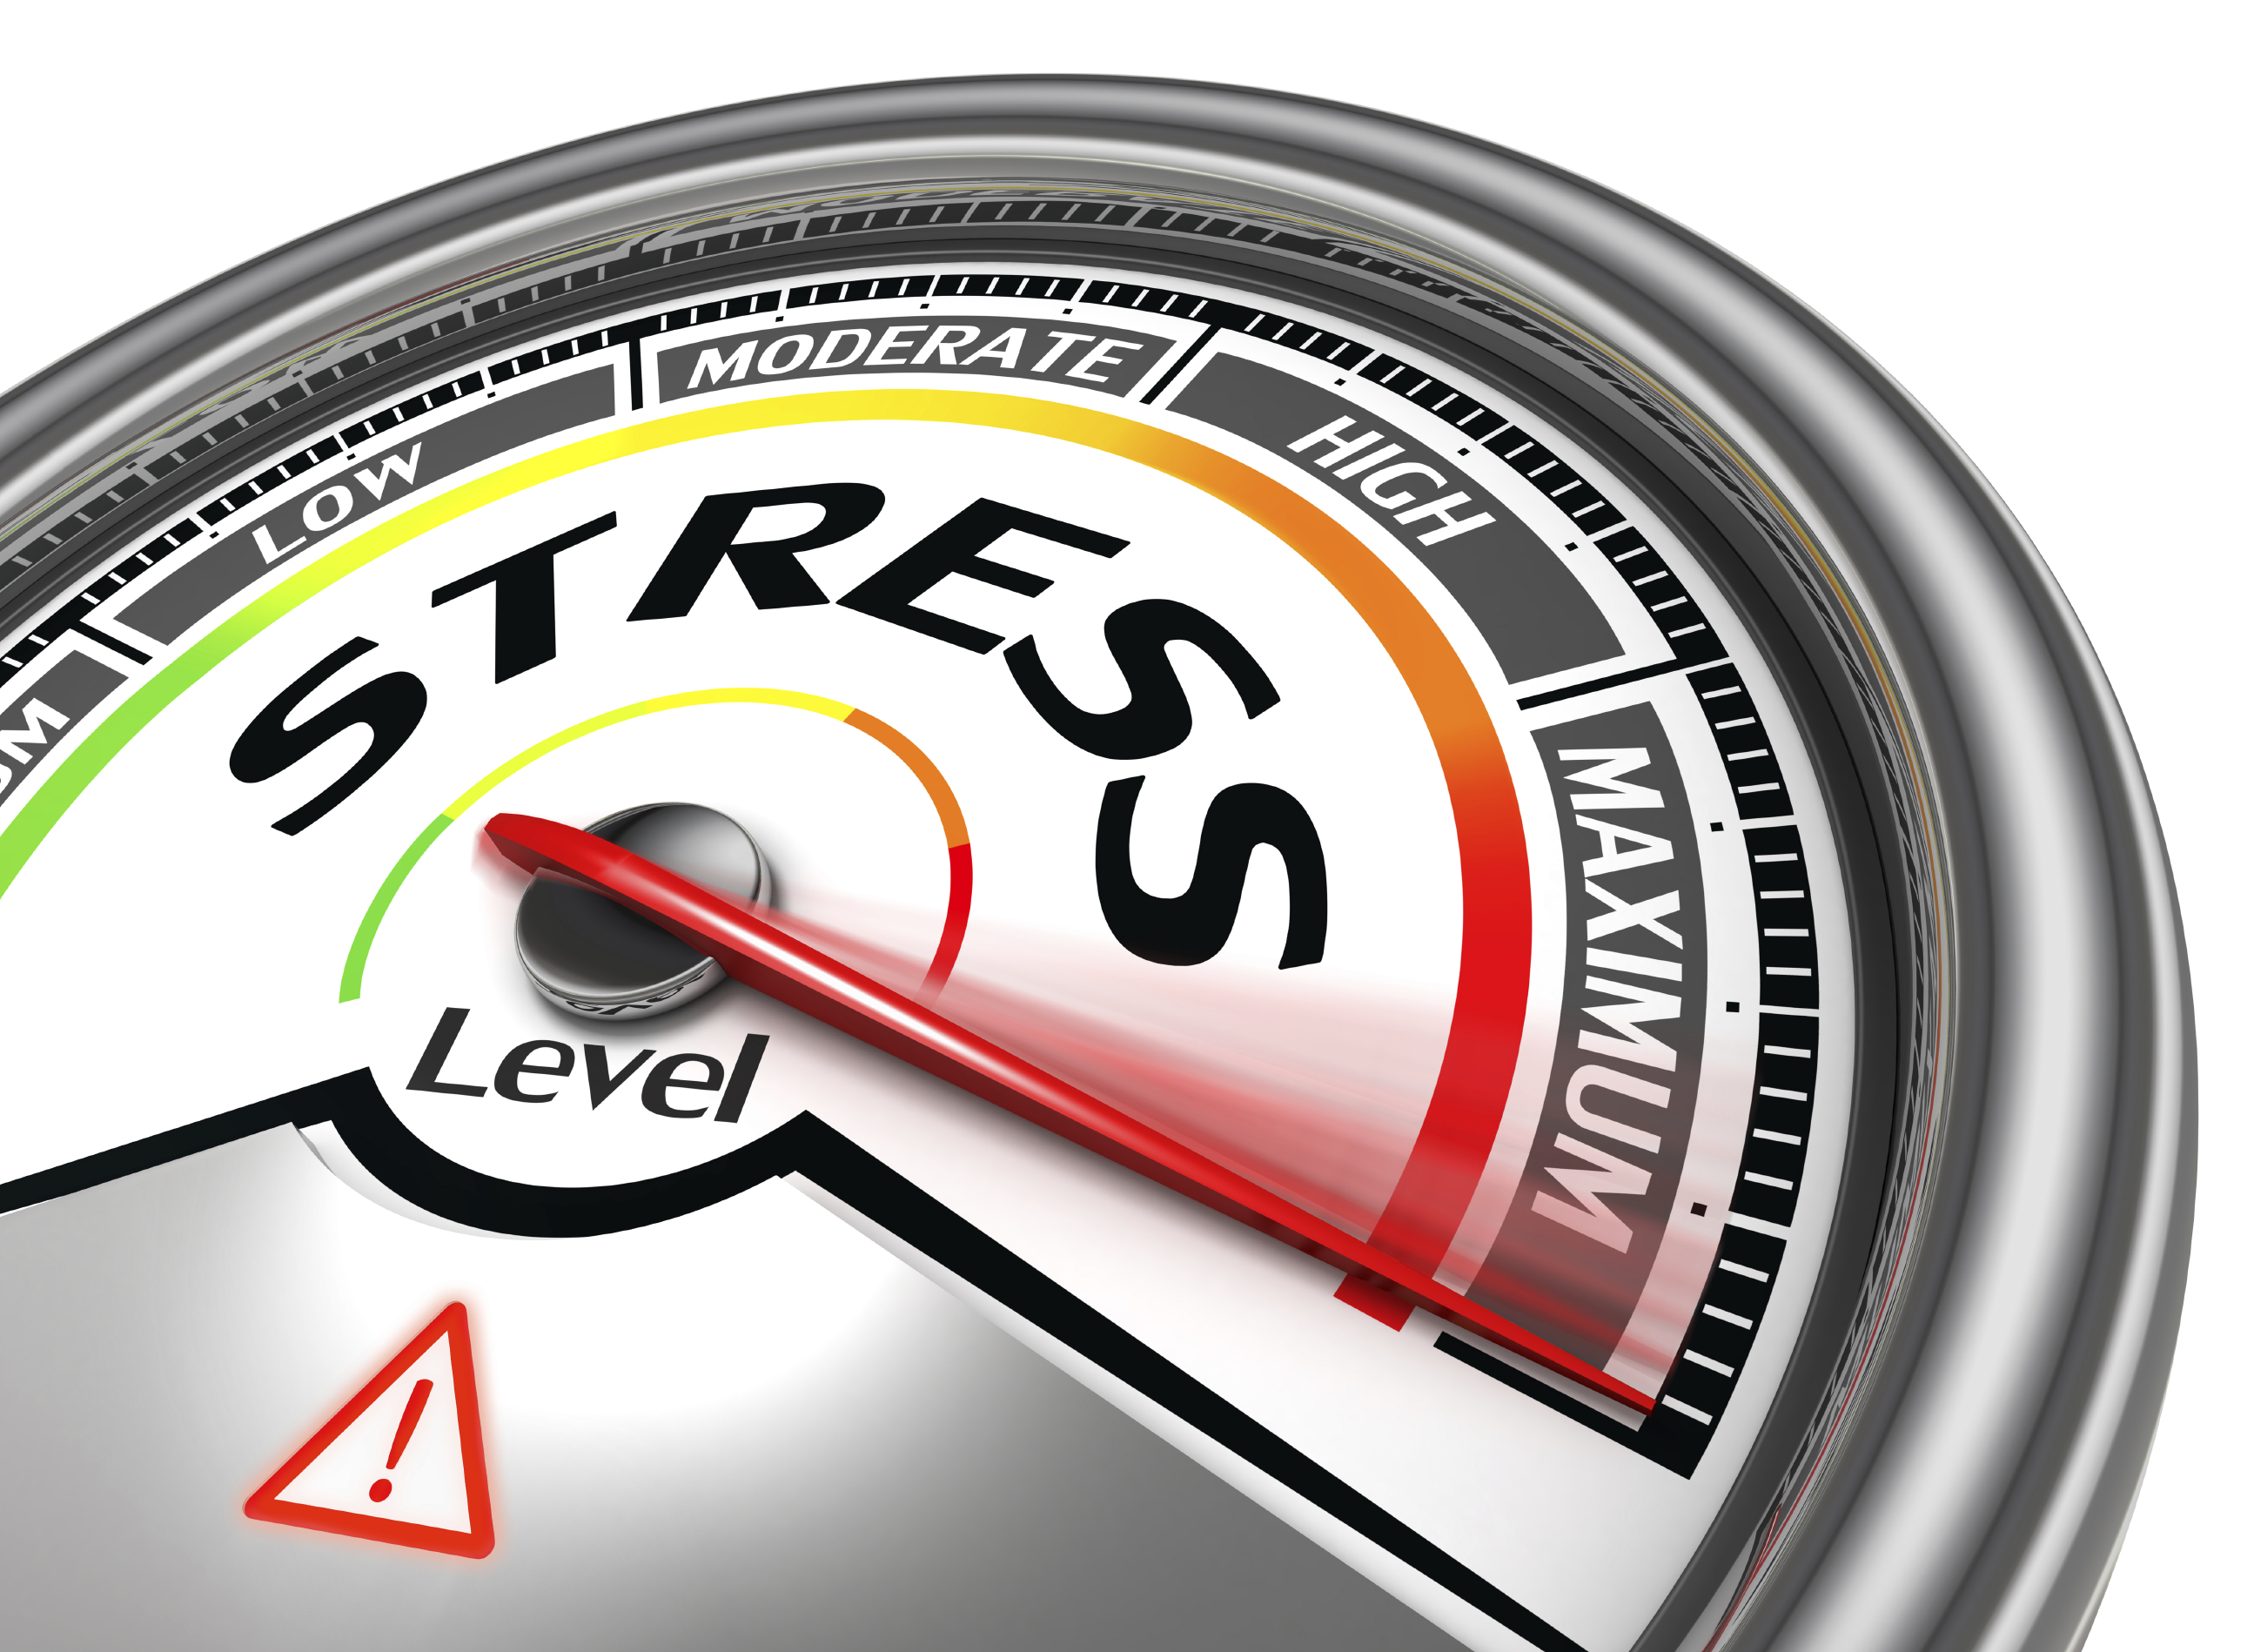 2019 STRESS